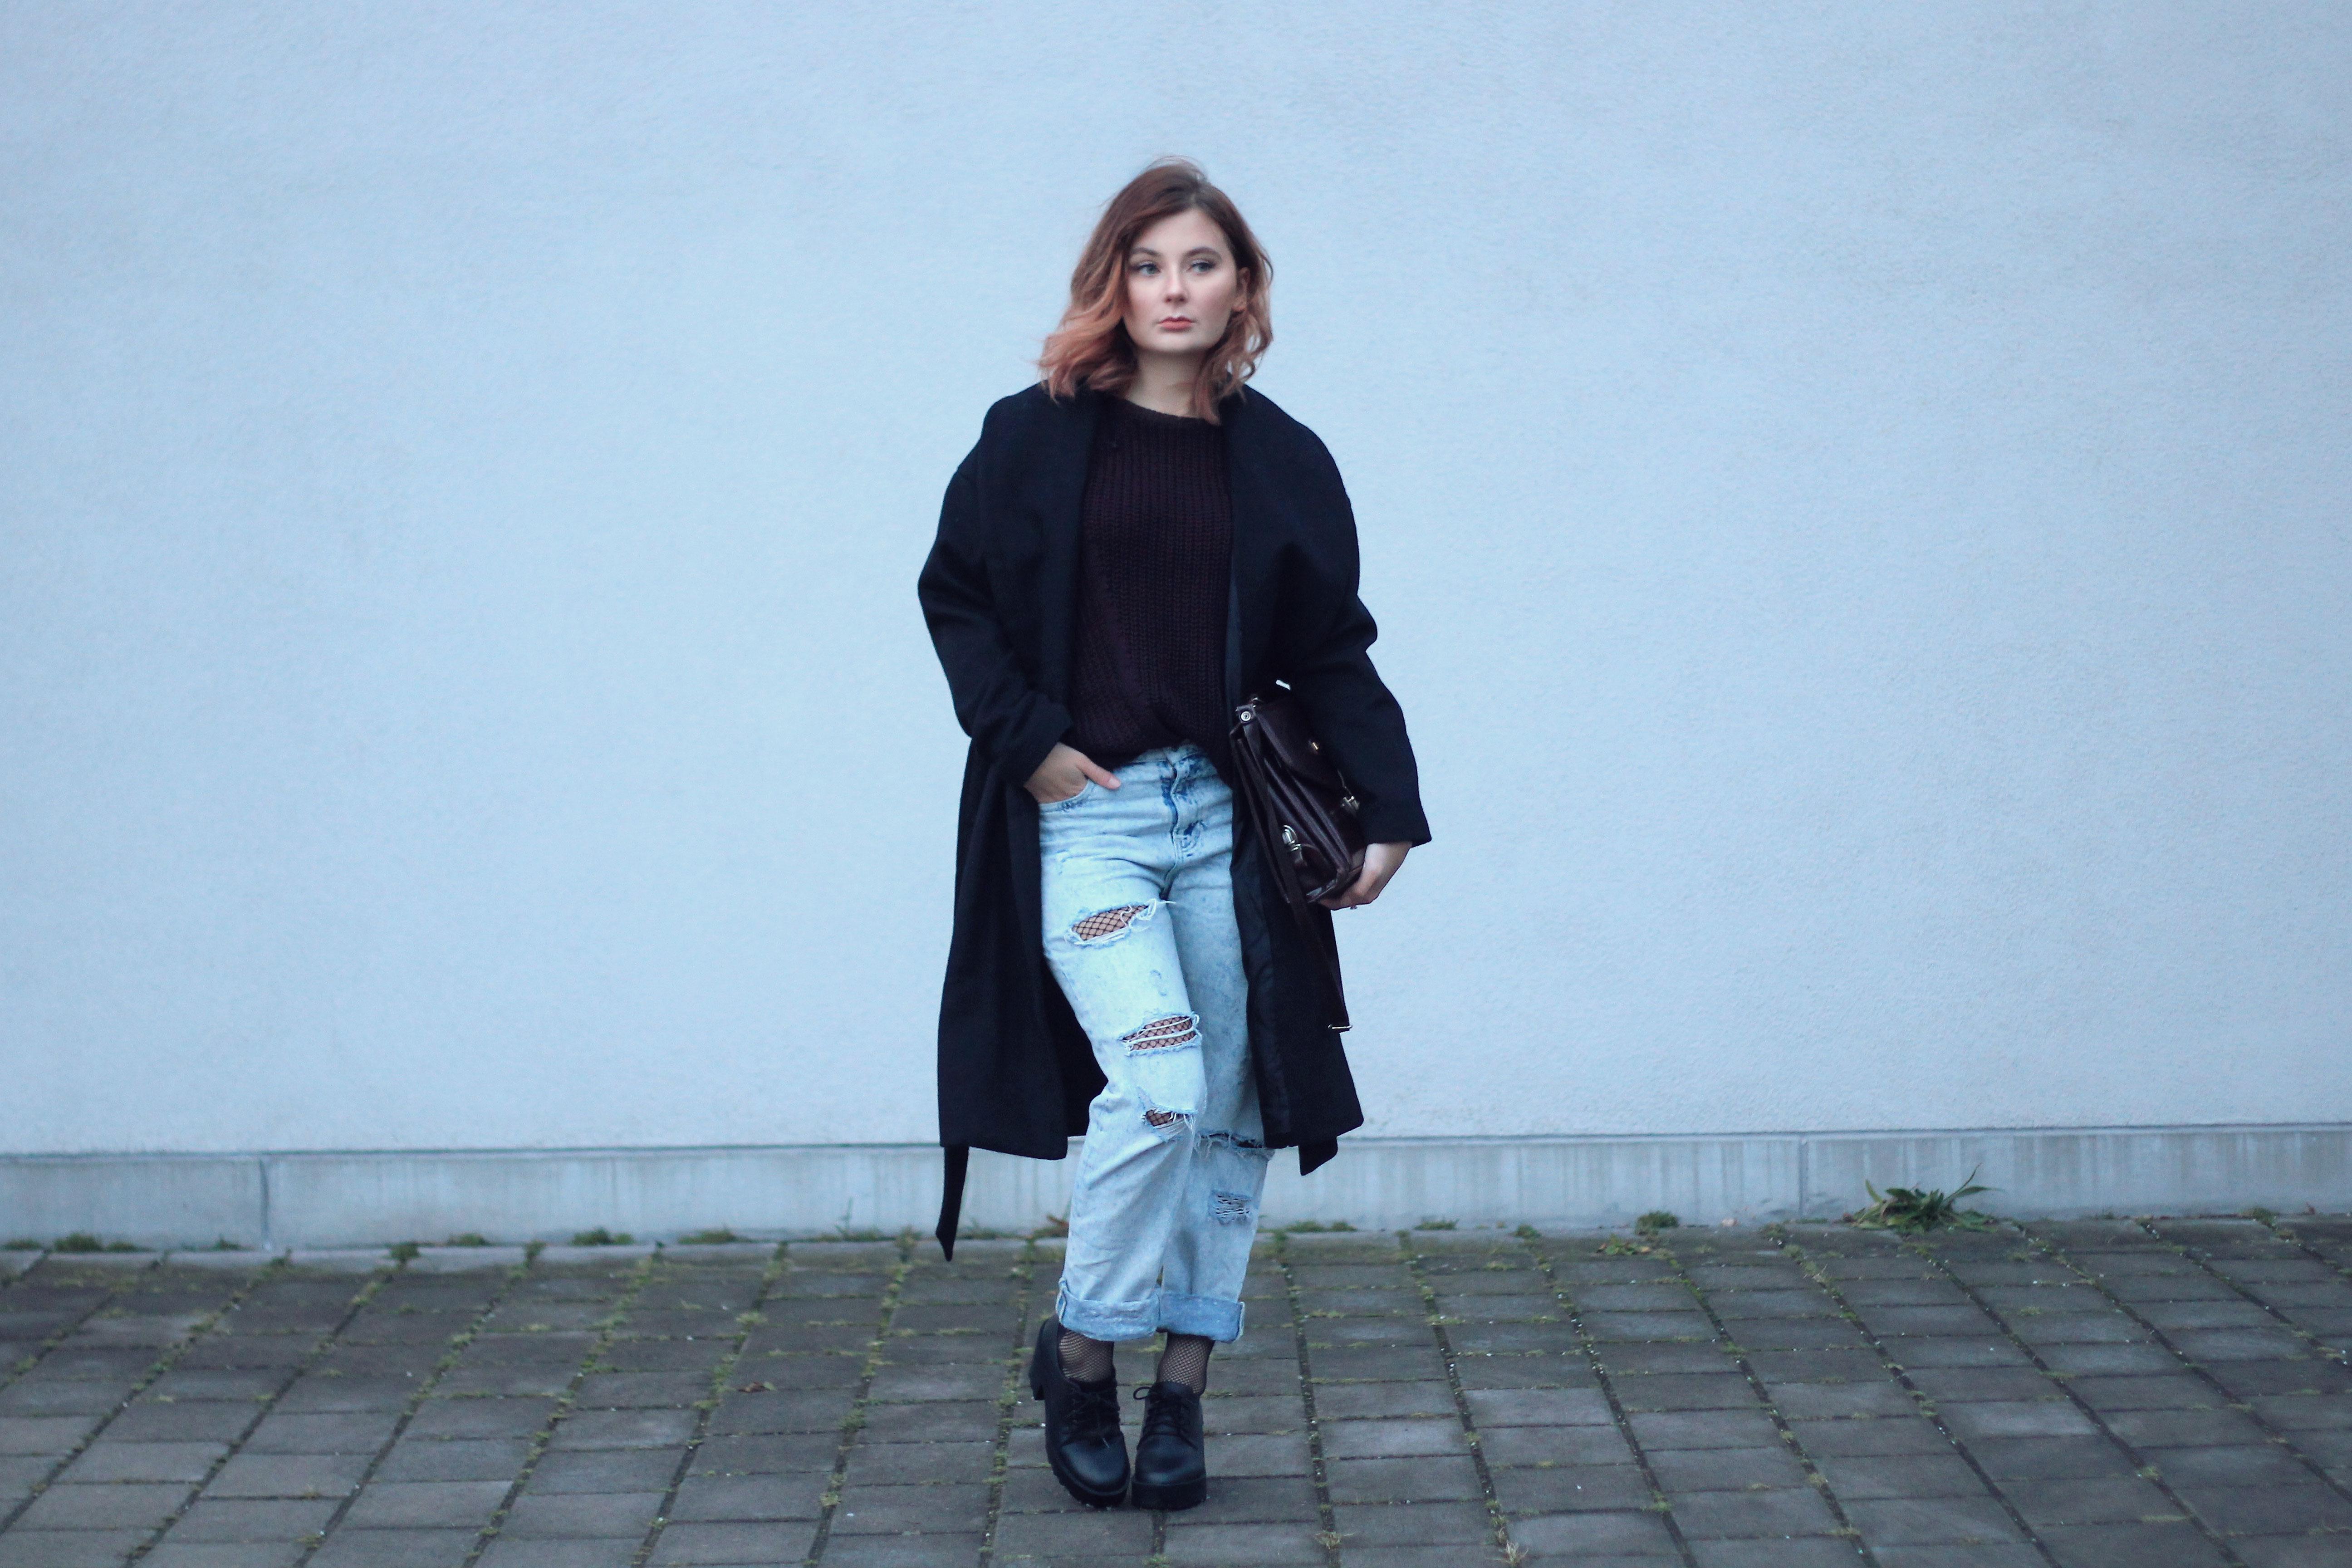 Look Fishnet Trend Netzstrumpfhose Boyfriend Jeans Coat Tasche Long Bob Stylist Modeblogger Fashionblogger Fashionblog Modeblog Lisa Jasmin Instagram Influencer Social Media